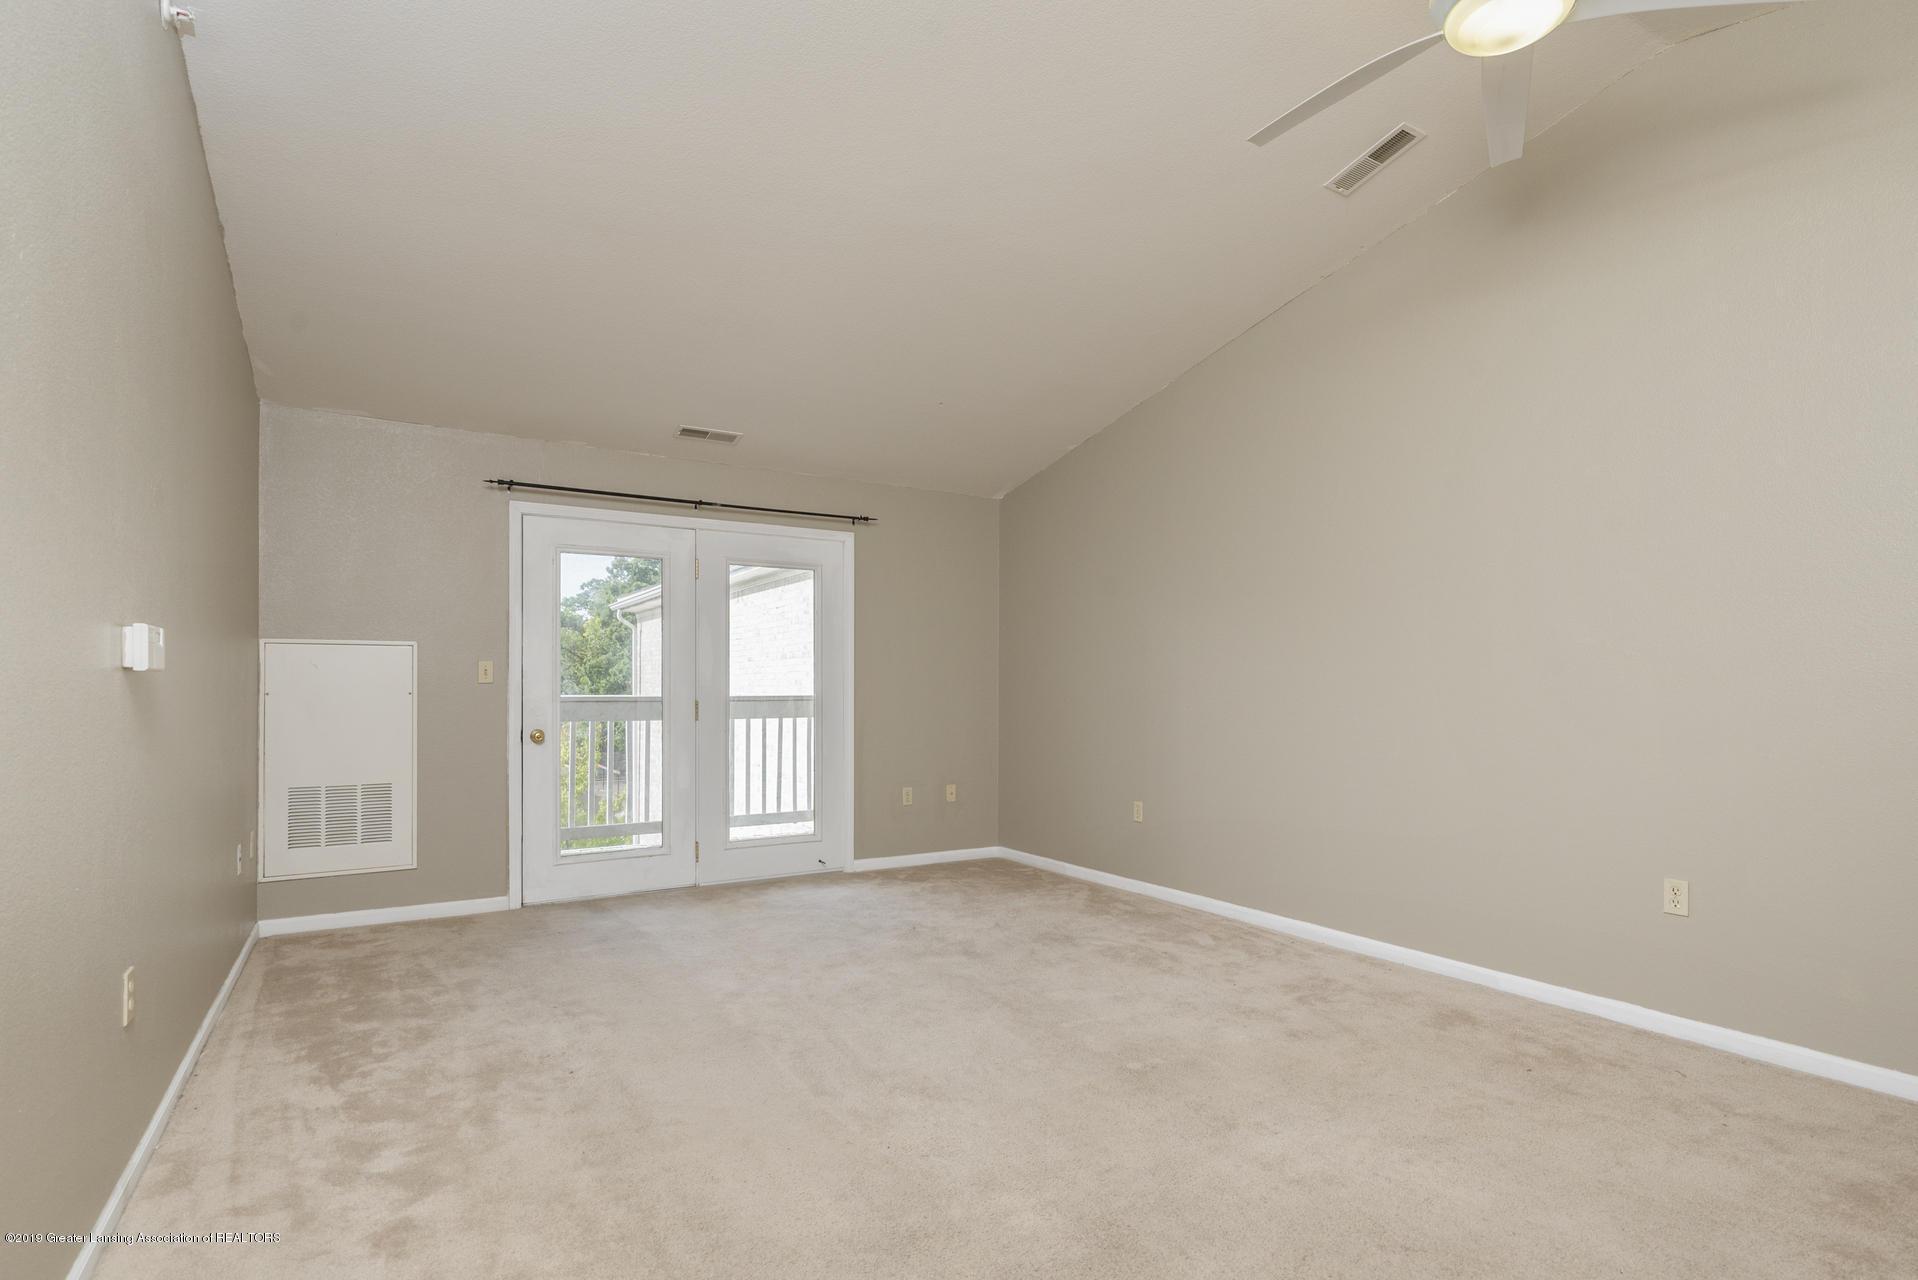 338 W Saginaw St UNIT 44 - 003-photo-living-room-7483690 - 4